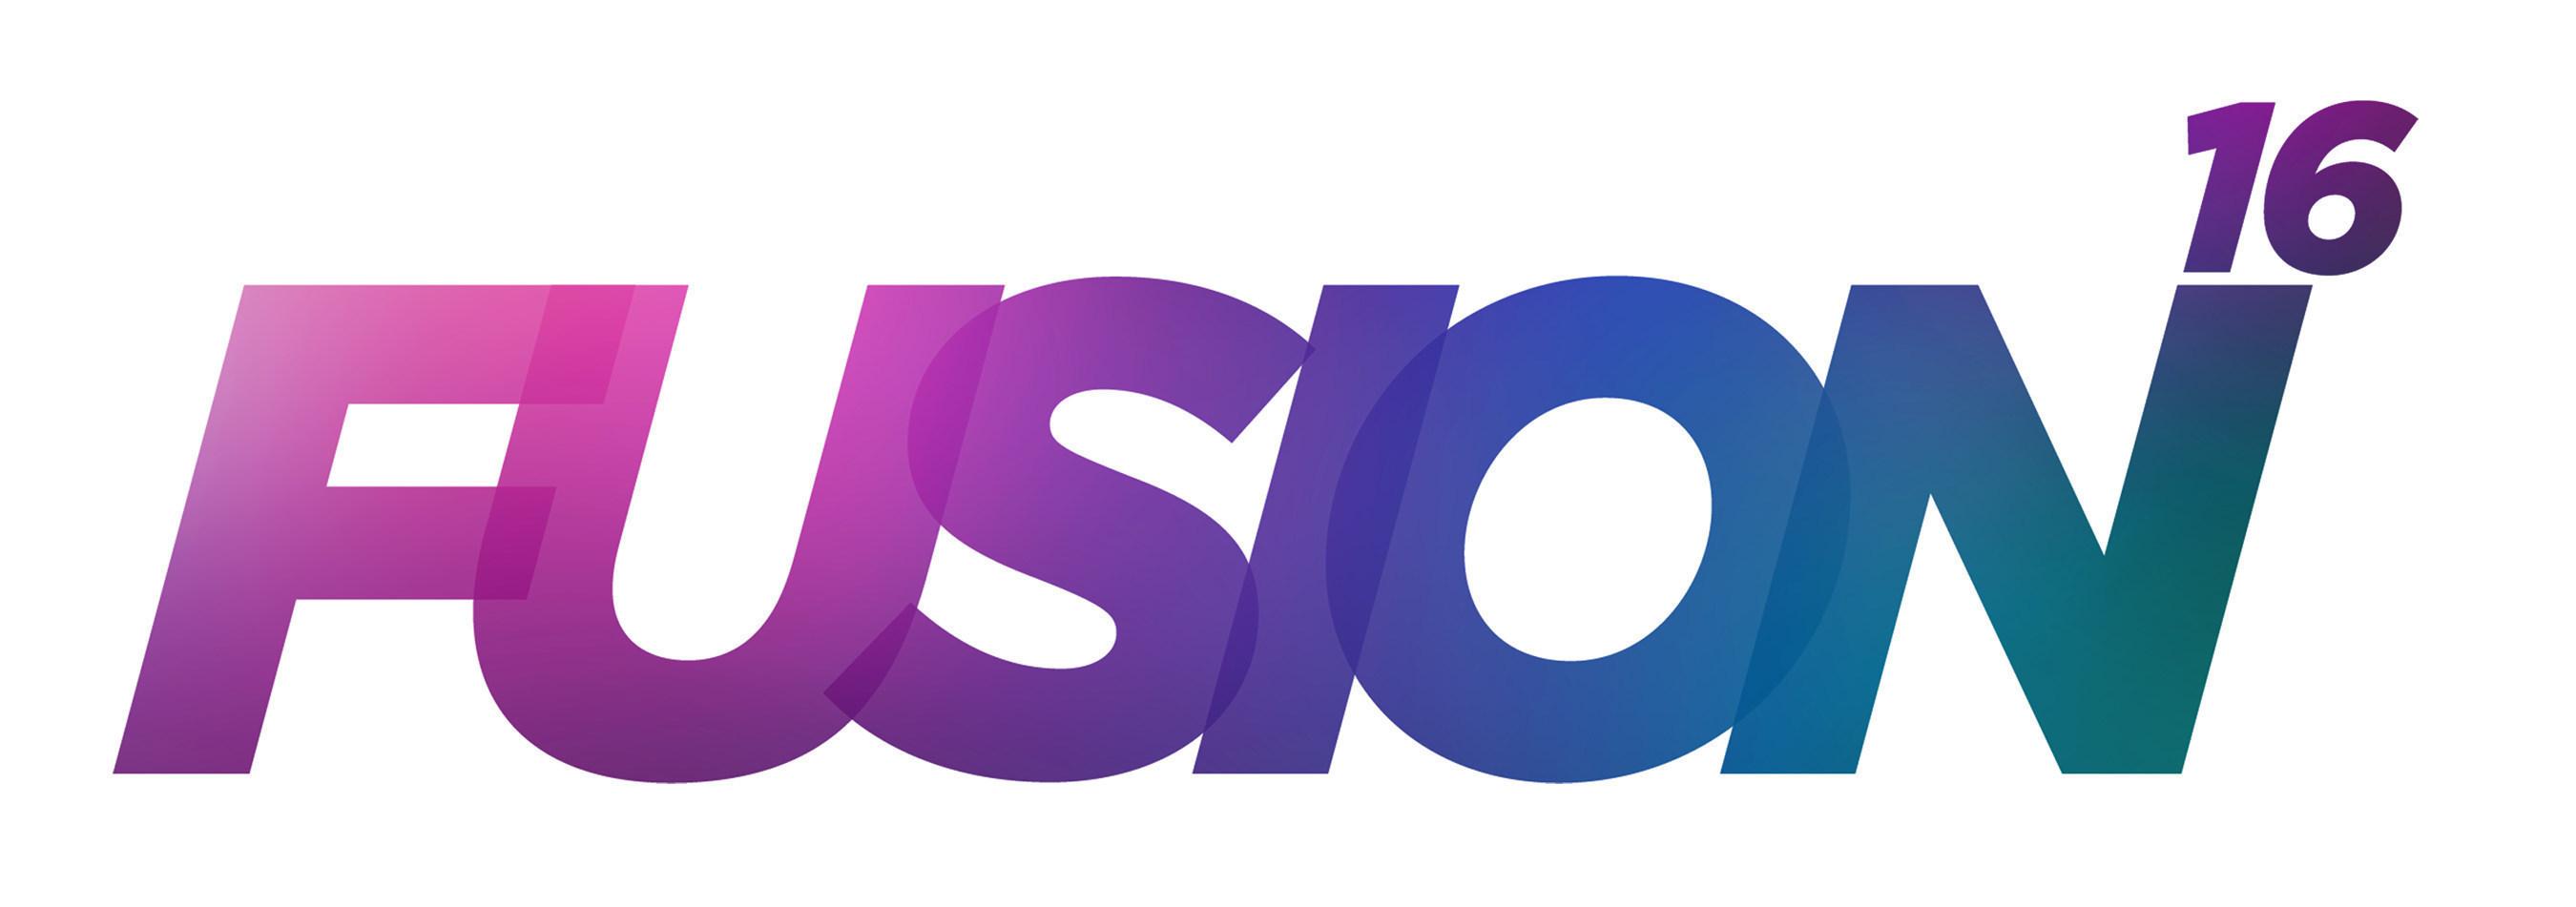 FUSION16